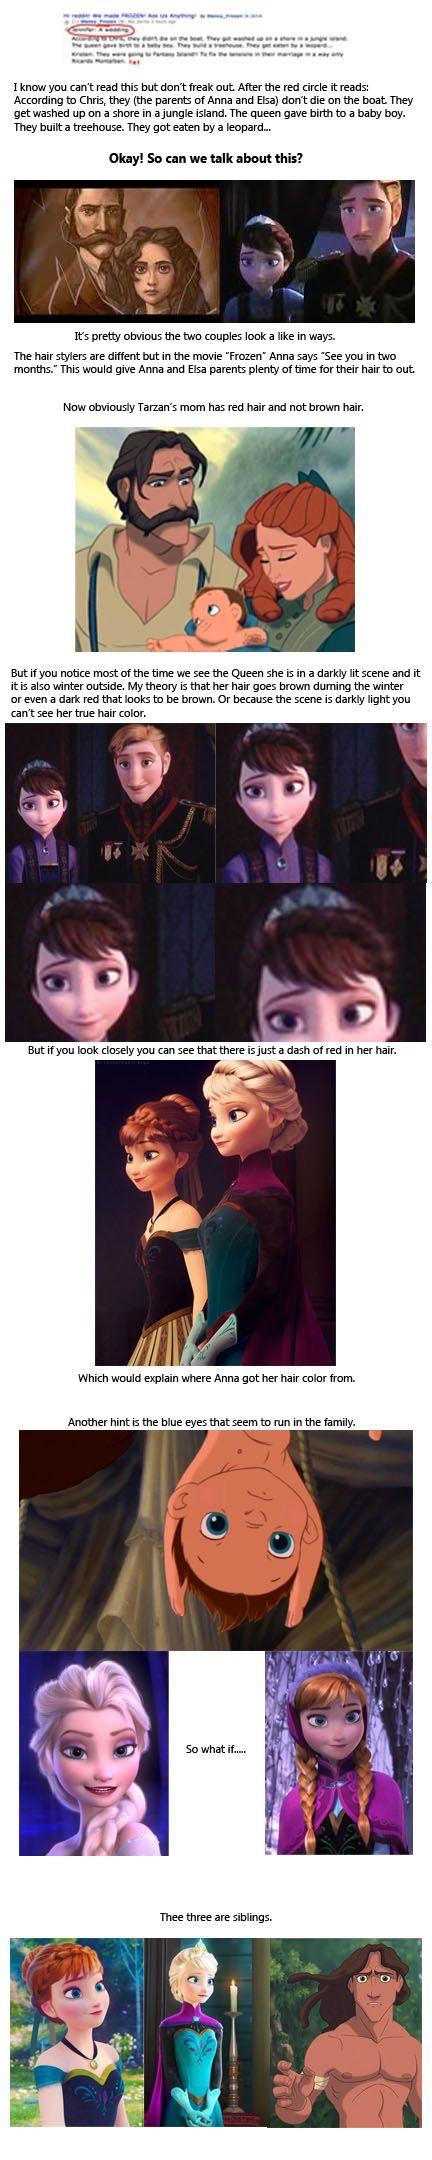 Prince Tarzan of Norway Disney theory, Disney secrets